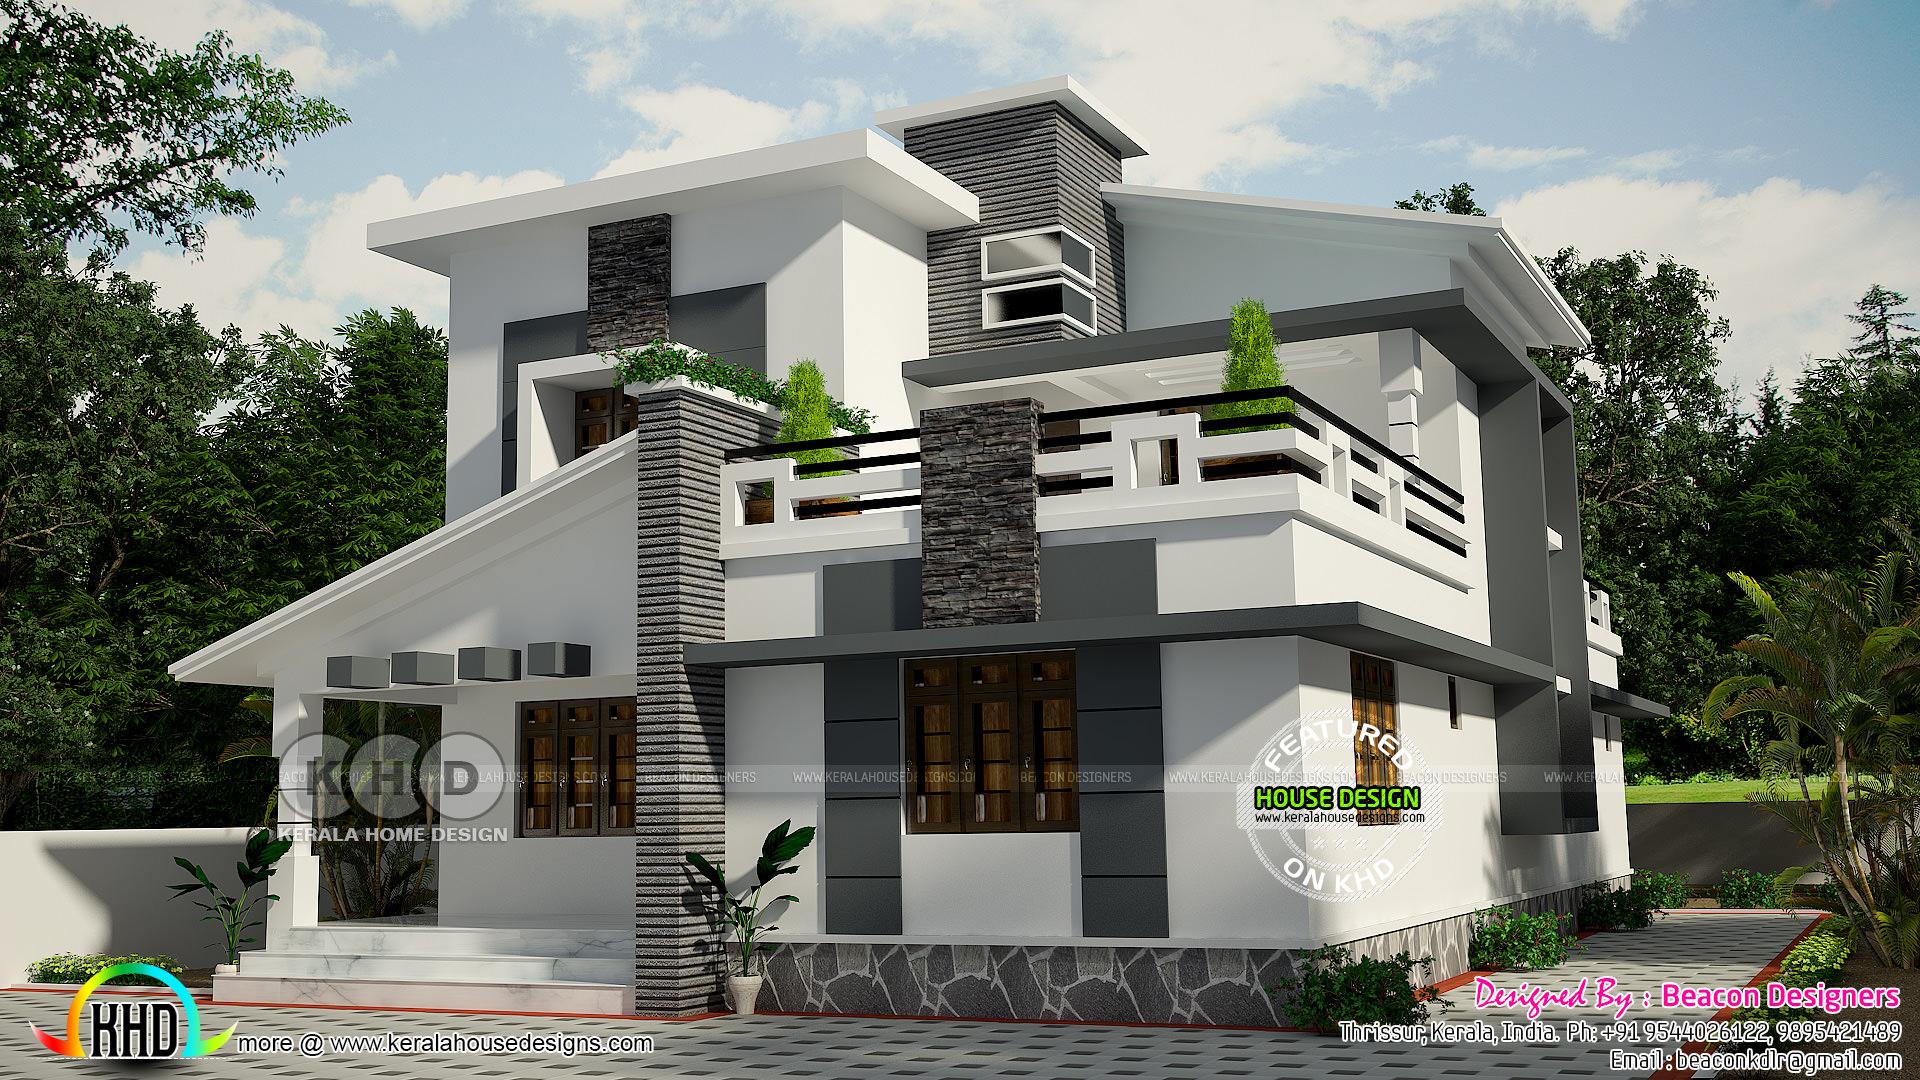 Home Design Kerala 2018 Part - 17: Please Follow Kerala Home Design